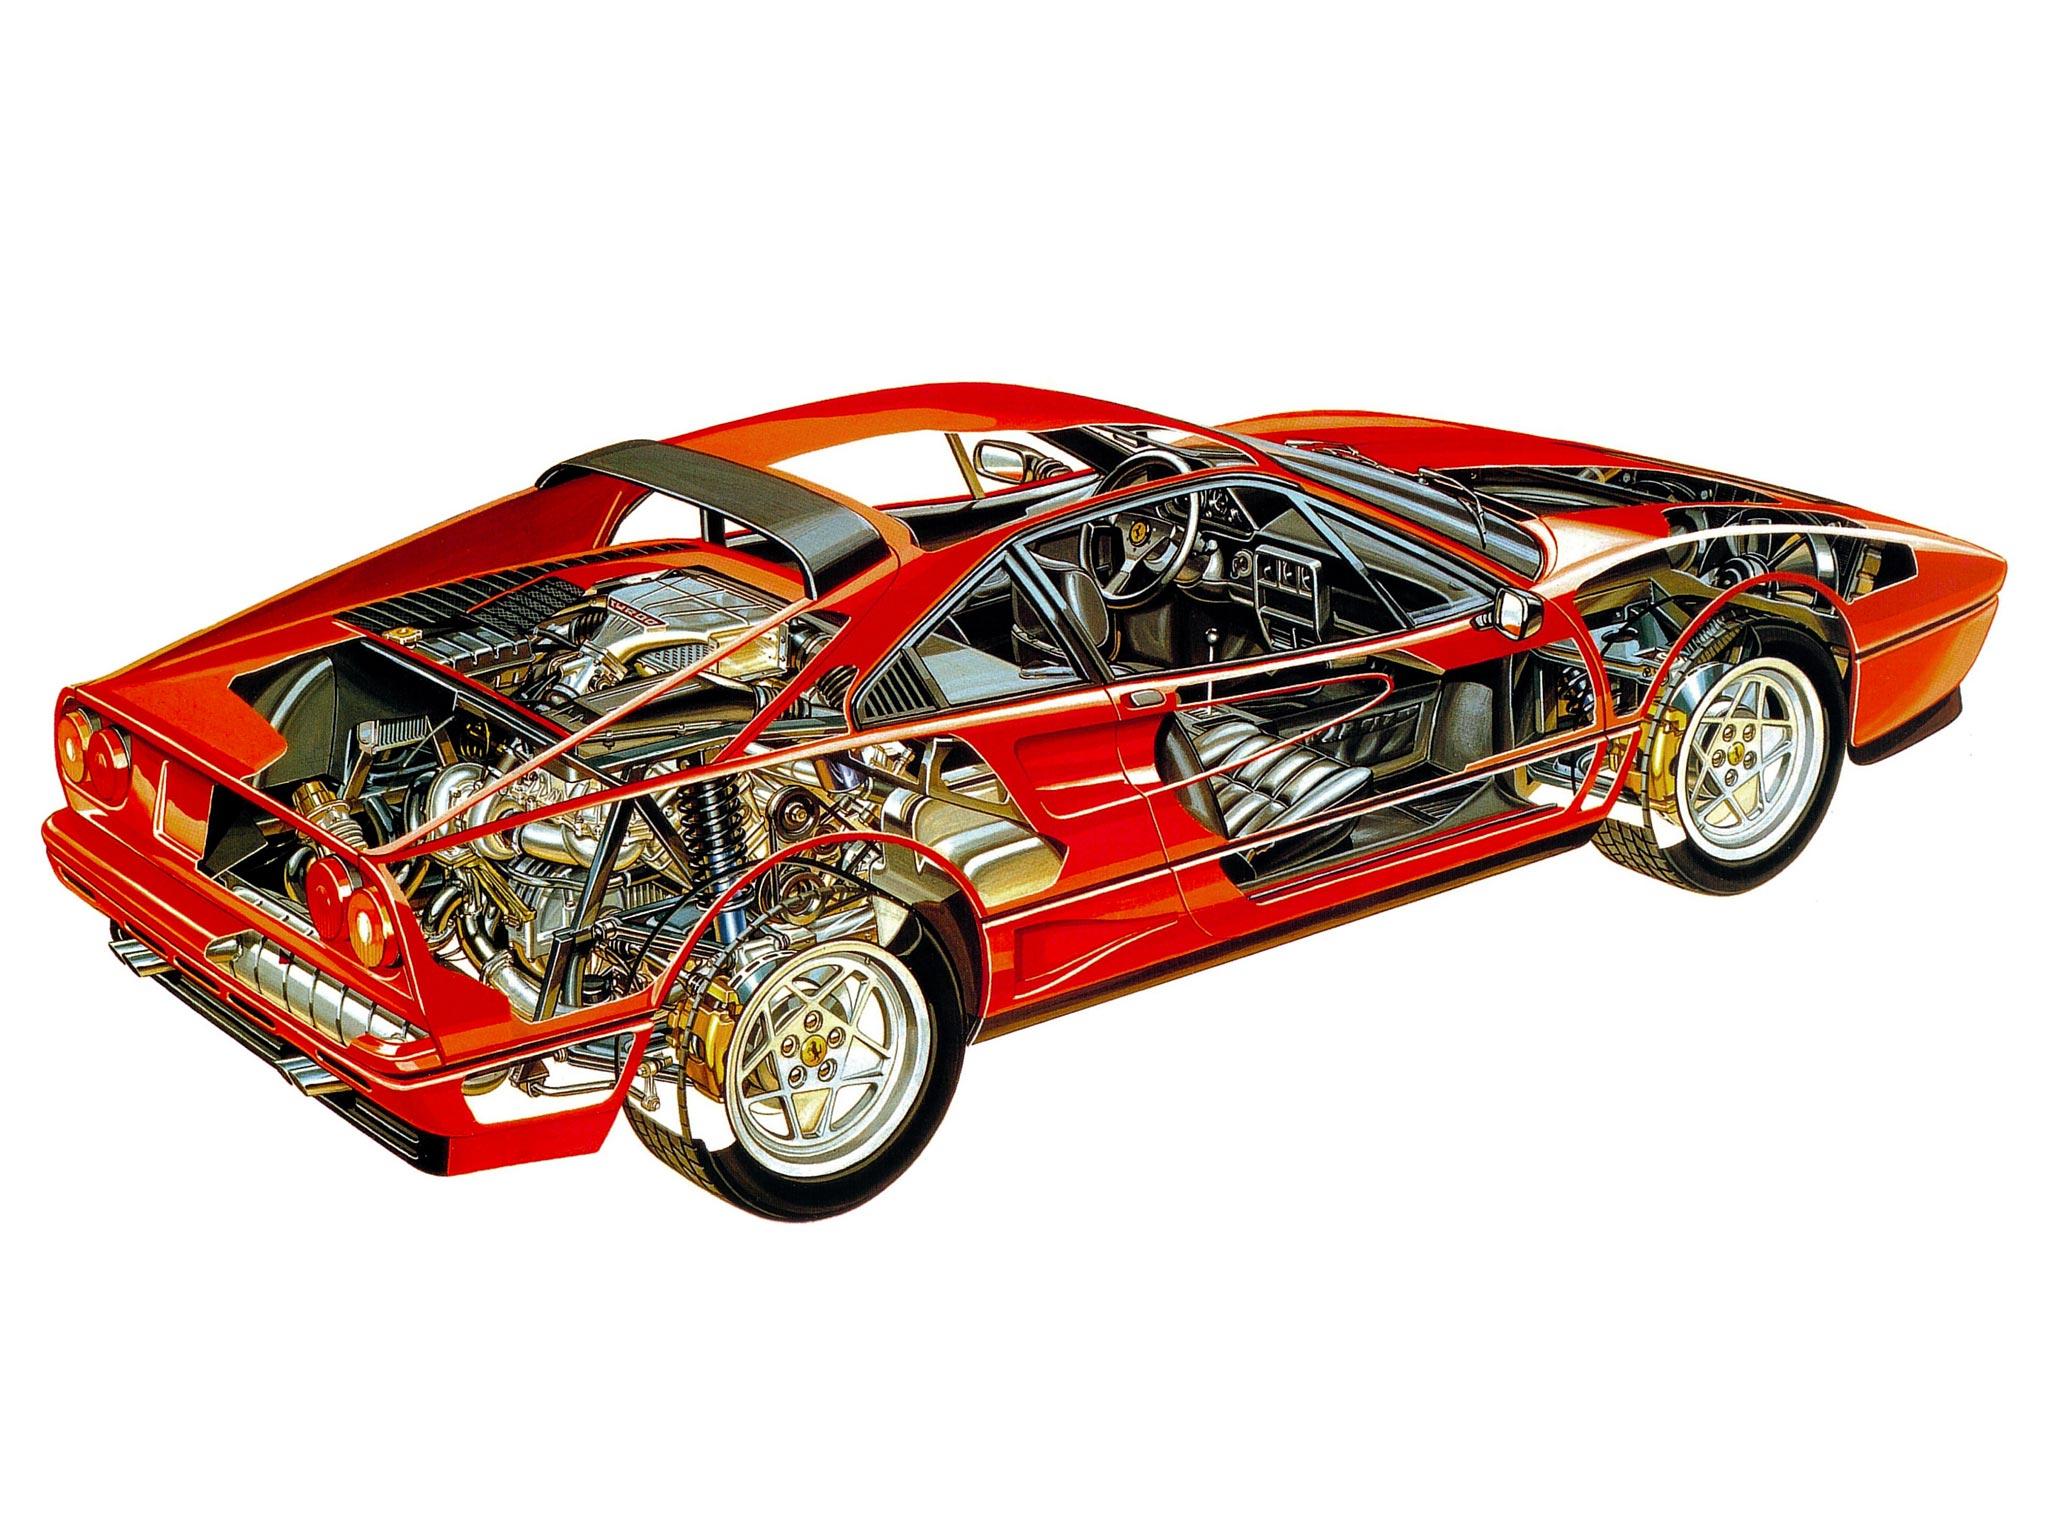 Ferrari GTB Turbo cutaway drawing